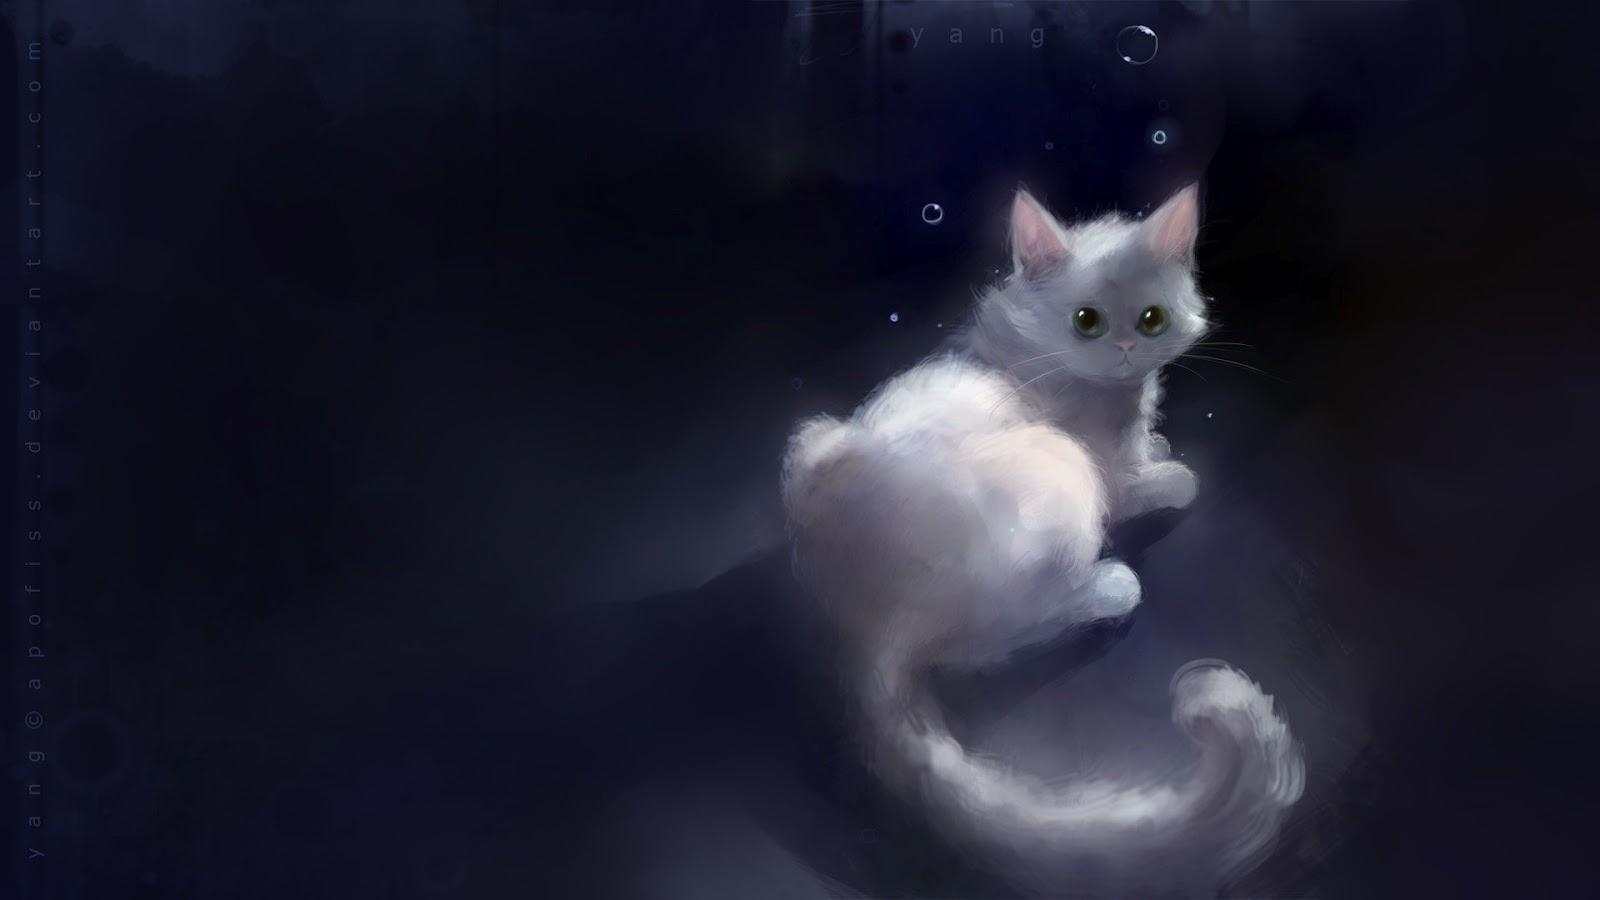 http://3.bp.blogspot.com/-wVO0mZ4D3t8/T9wcdhvDBvI/AAAAAAAADTg/RfOS53Sb3MM/s1600/Apofiss+small+black+cat+wallpaper+watercolor+%252820%2529.jpg